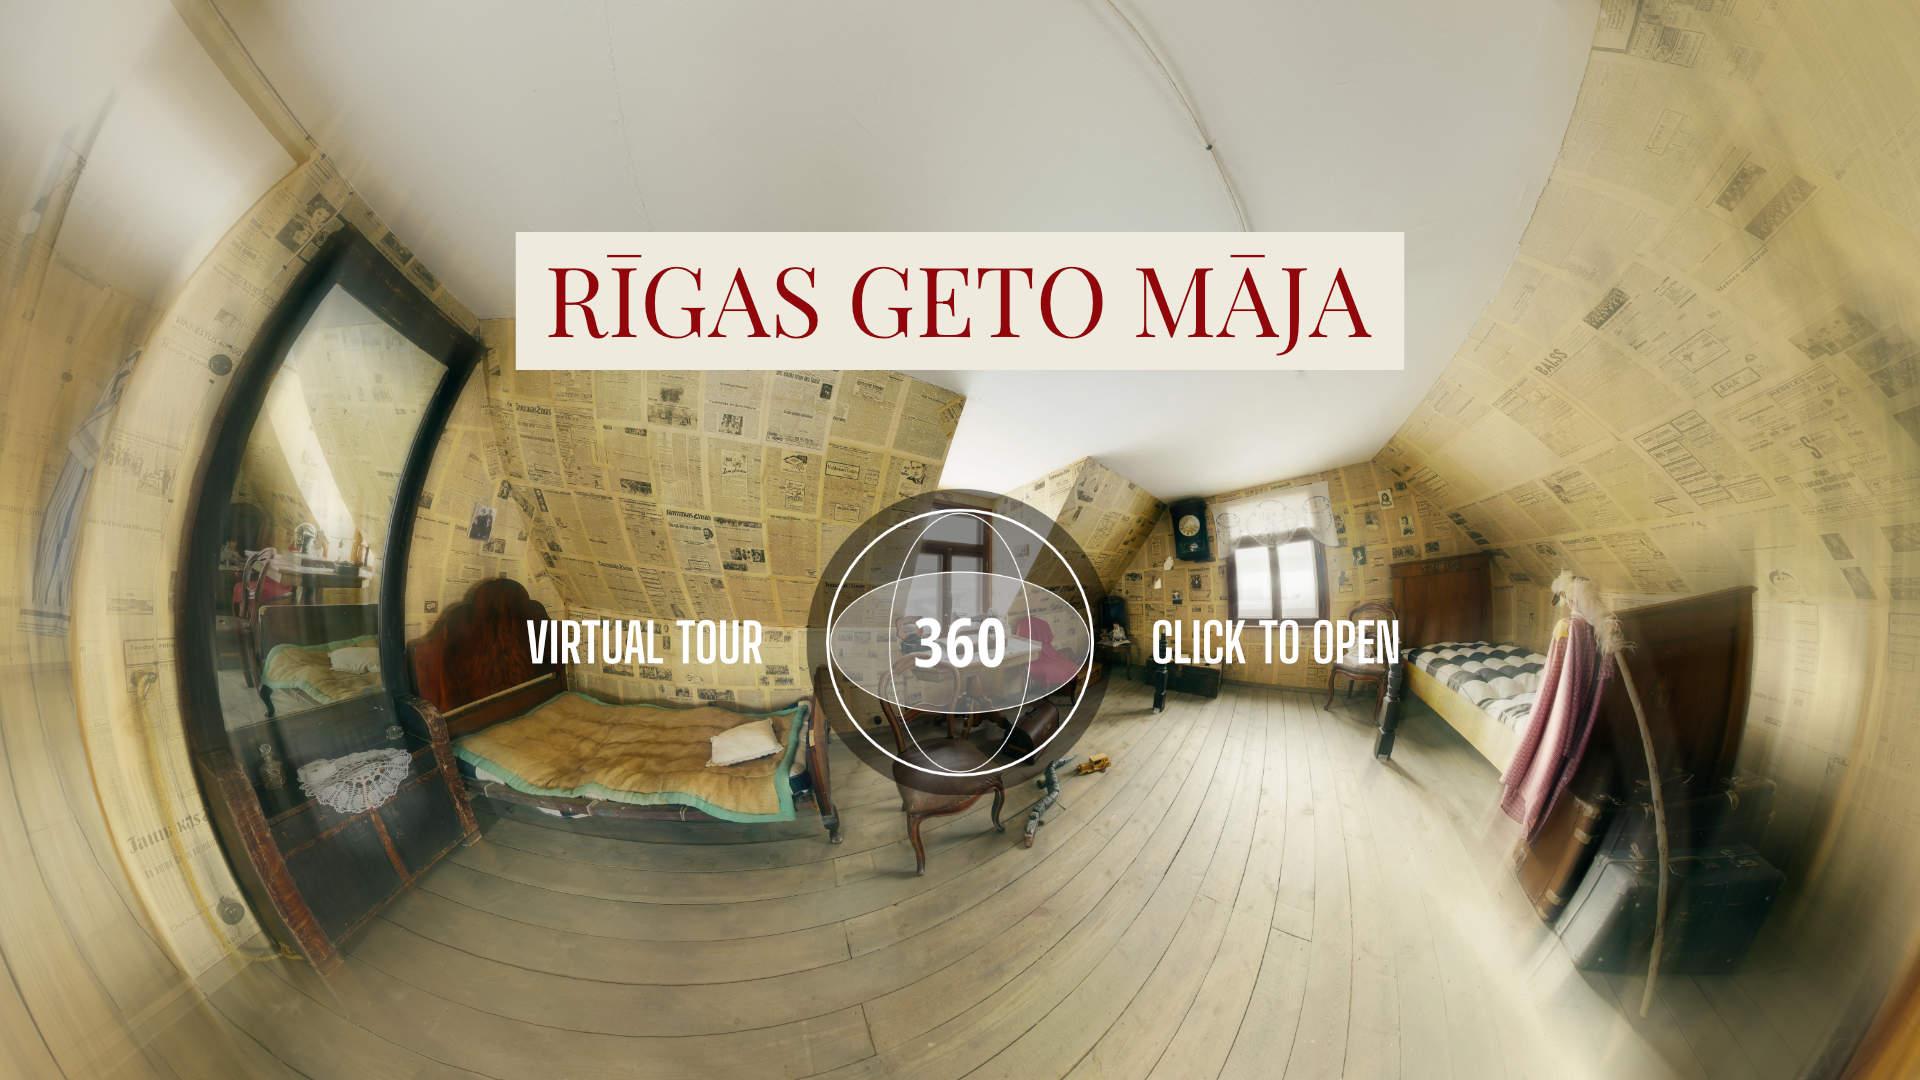 Rīgas Geto Māja